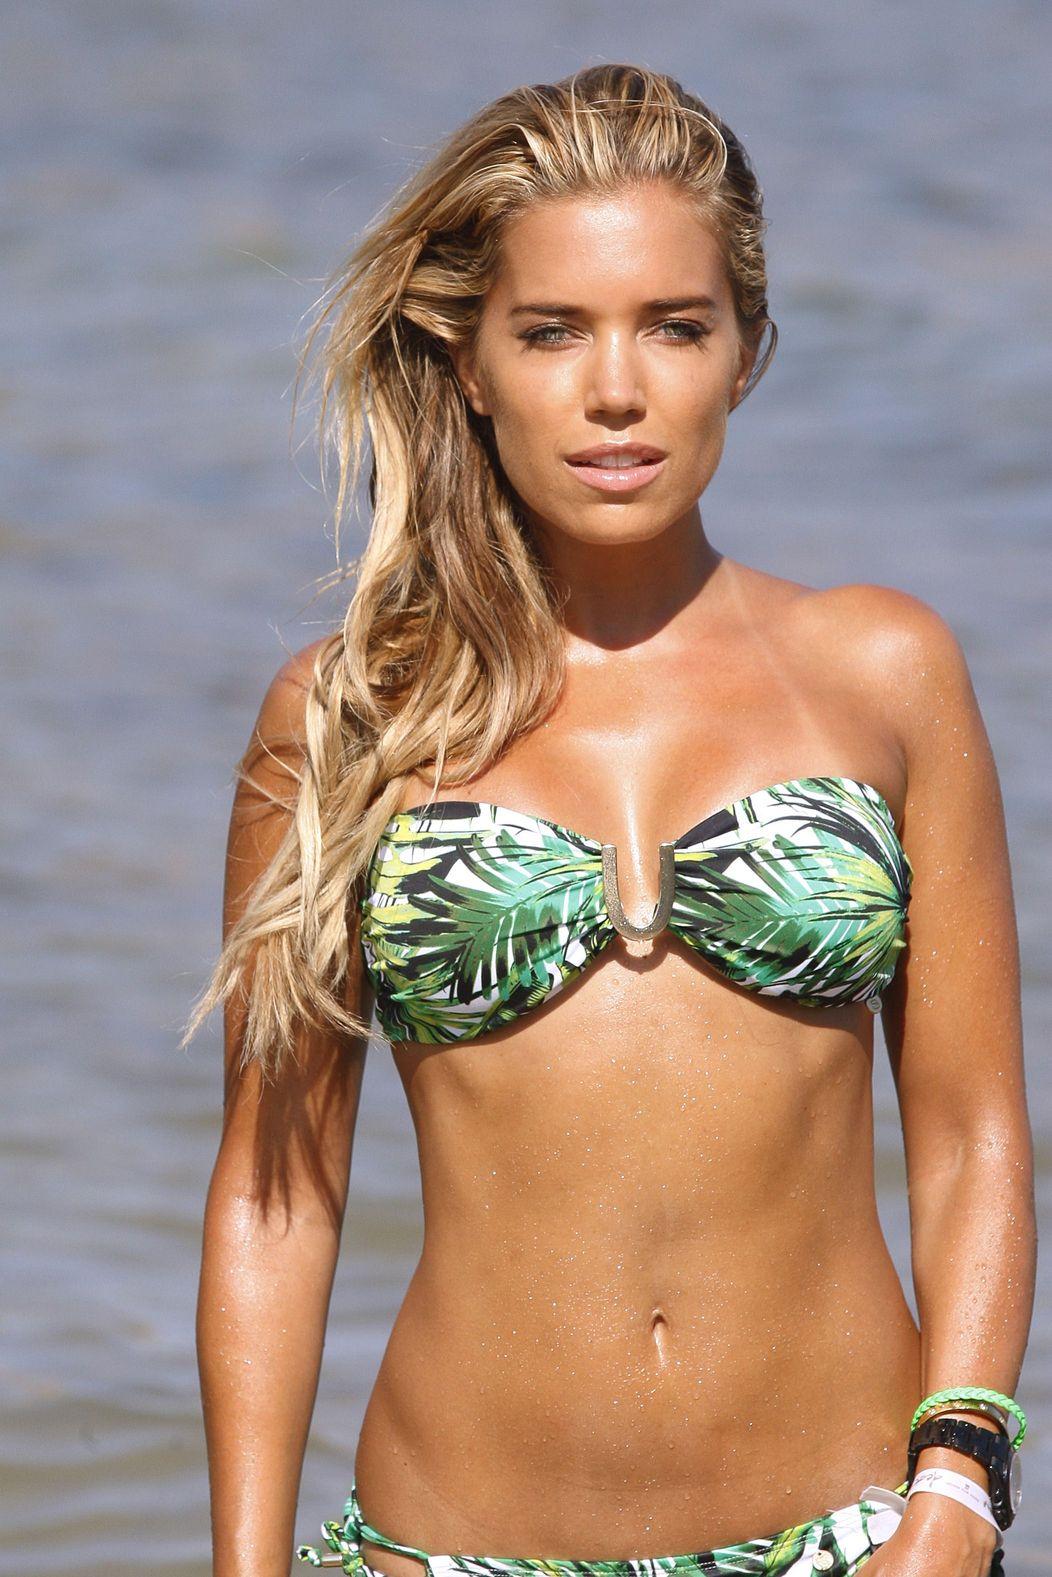 Sylvie Meis in a Bikini (40 Photos)